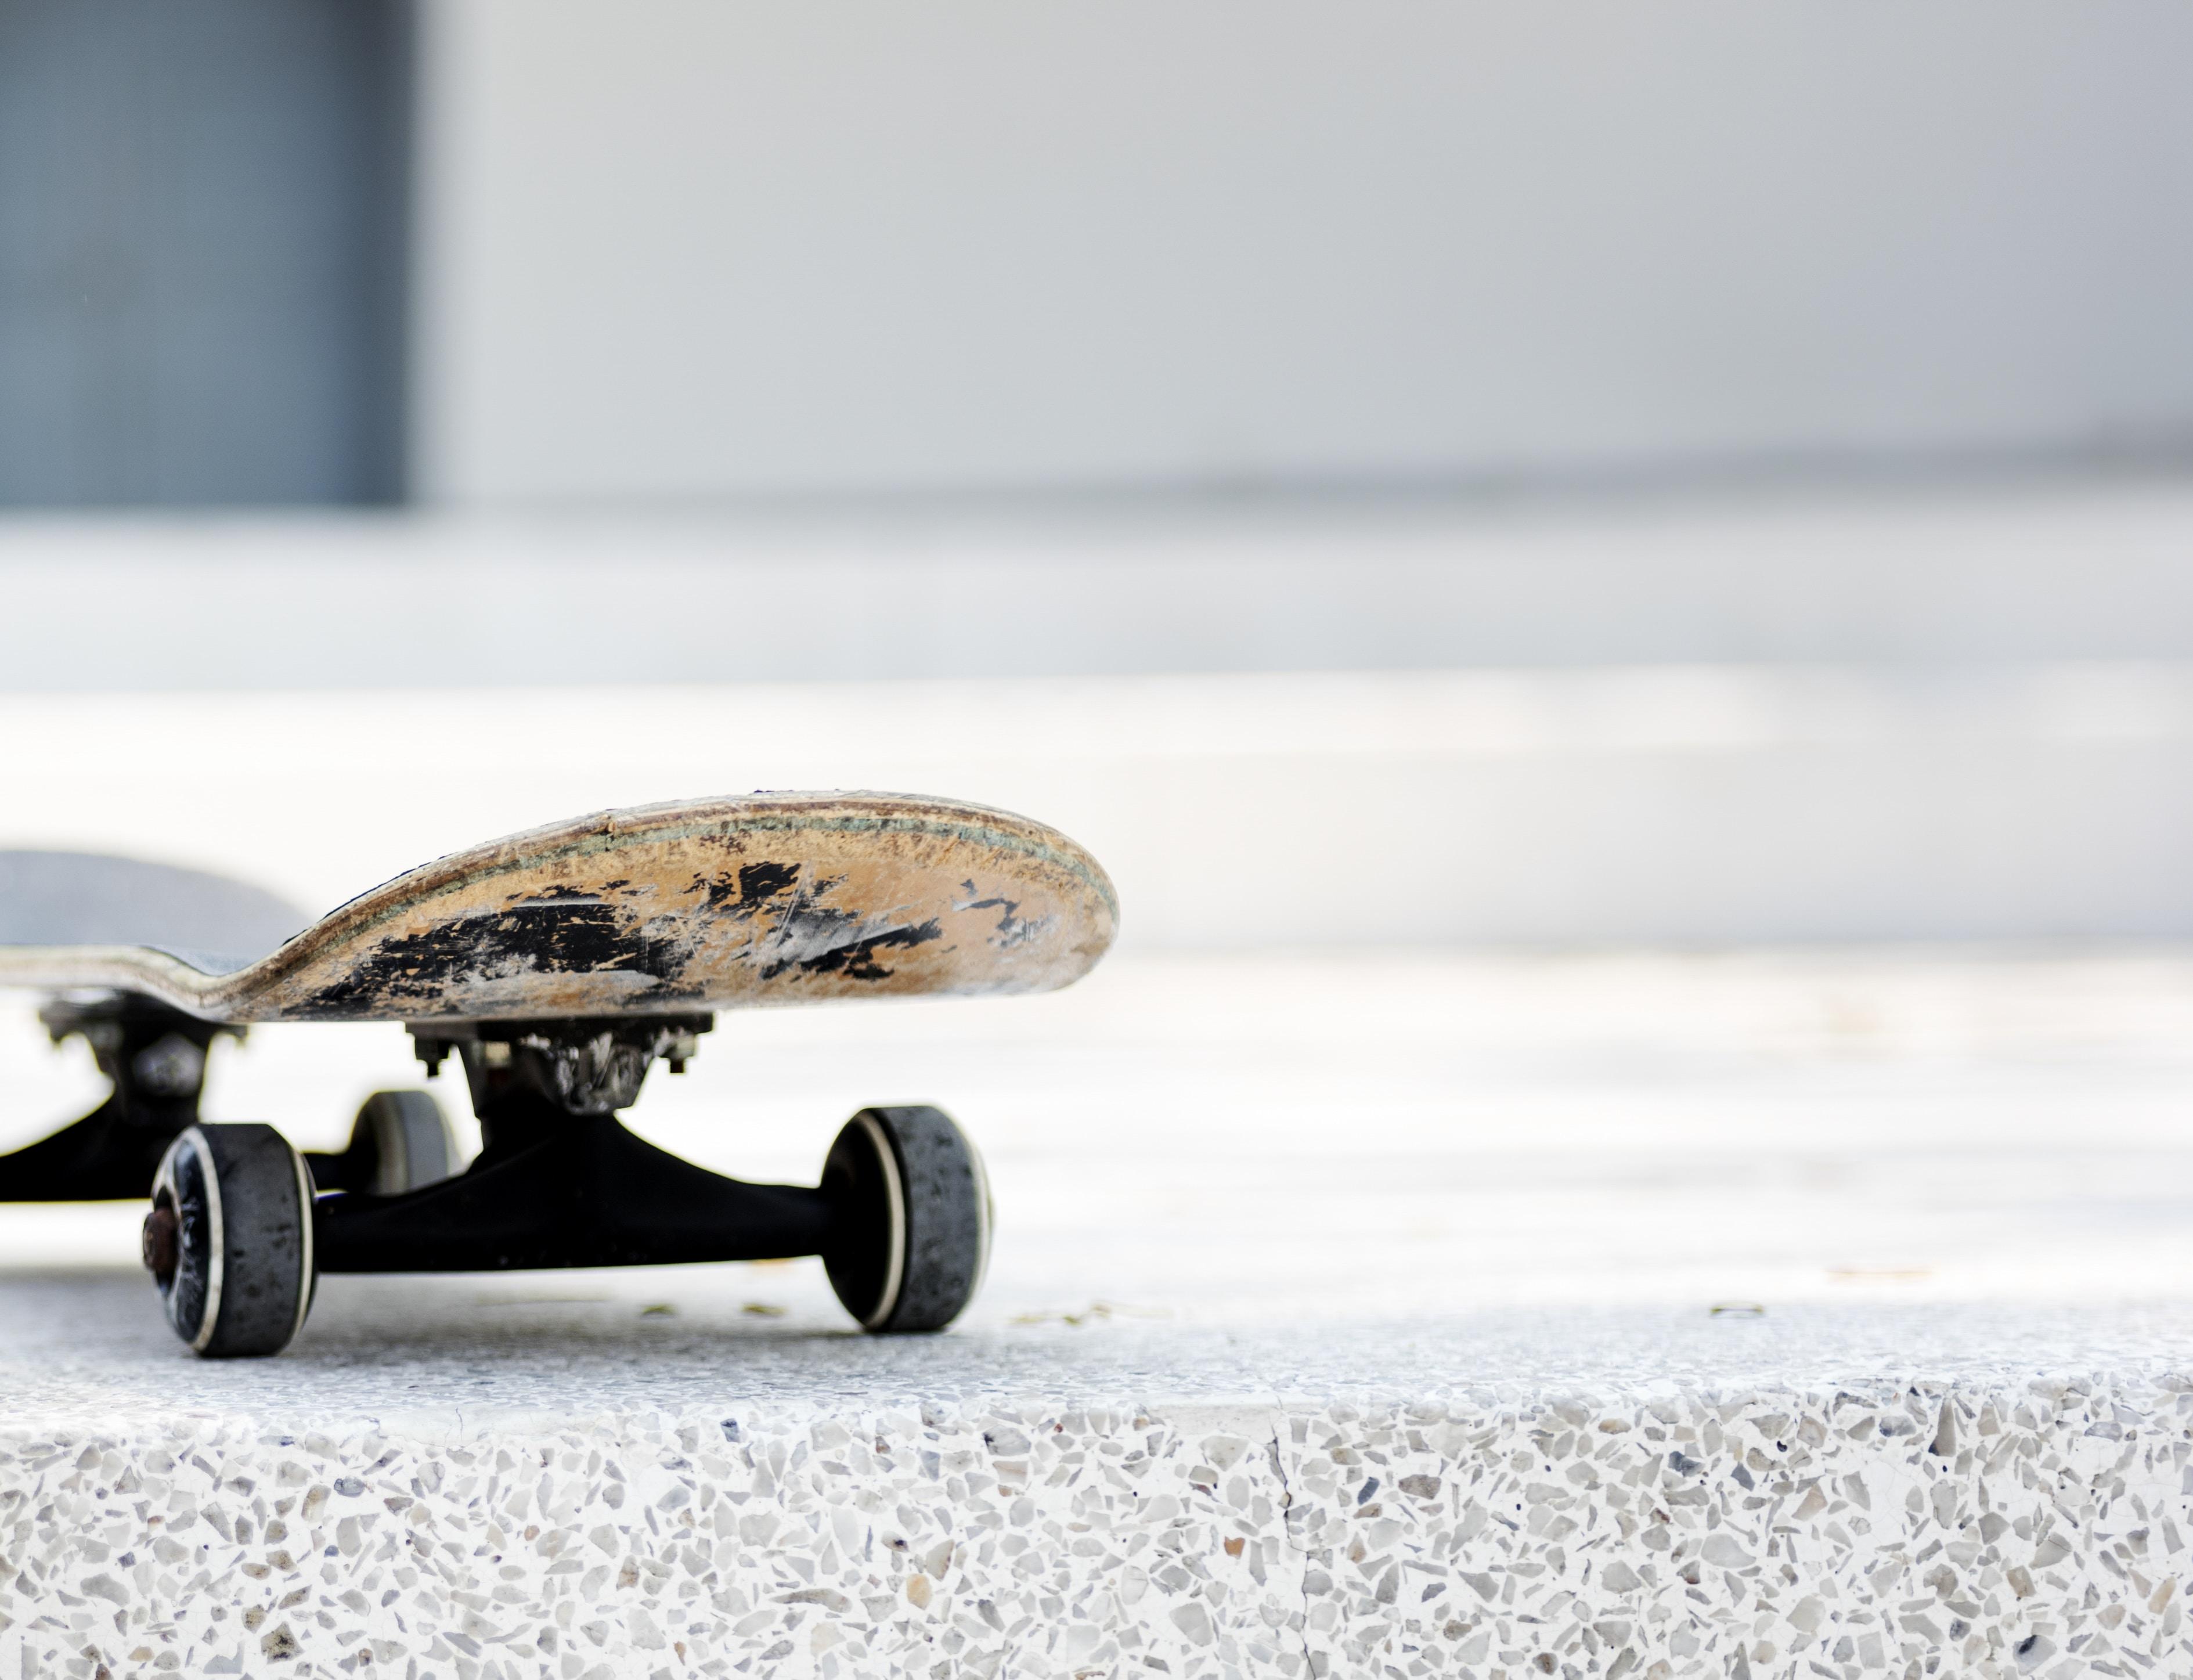 skateboard on ground